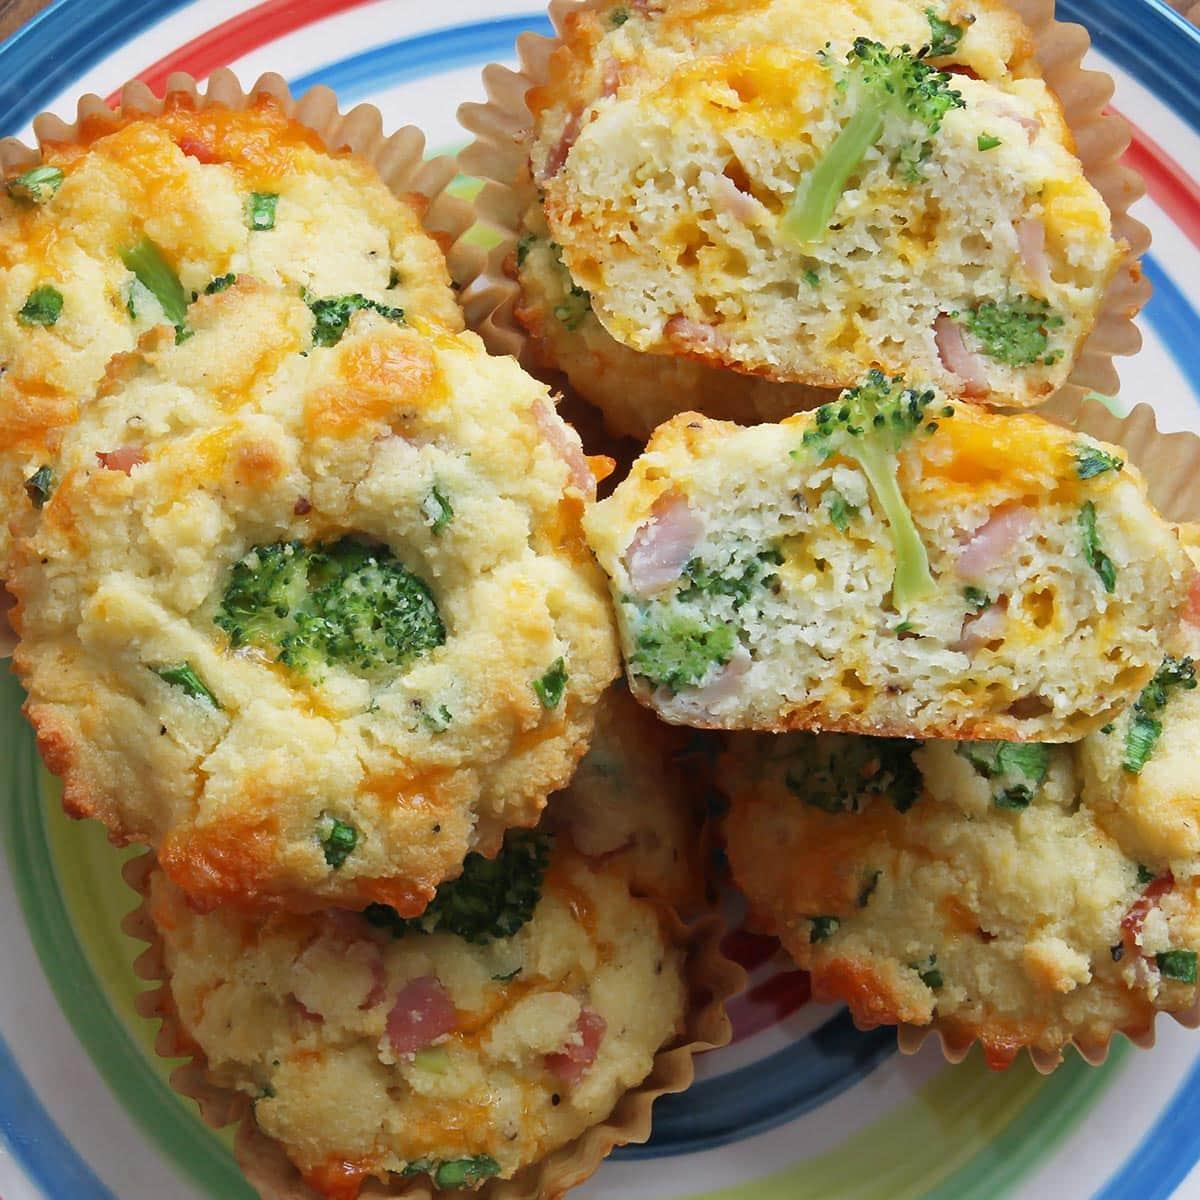 Broccoli Cheddar Muffins on a plate